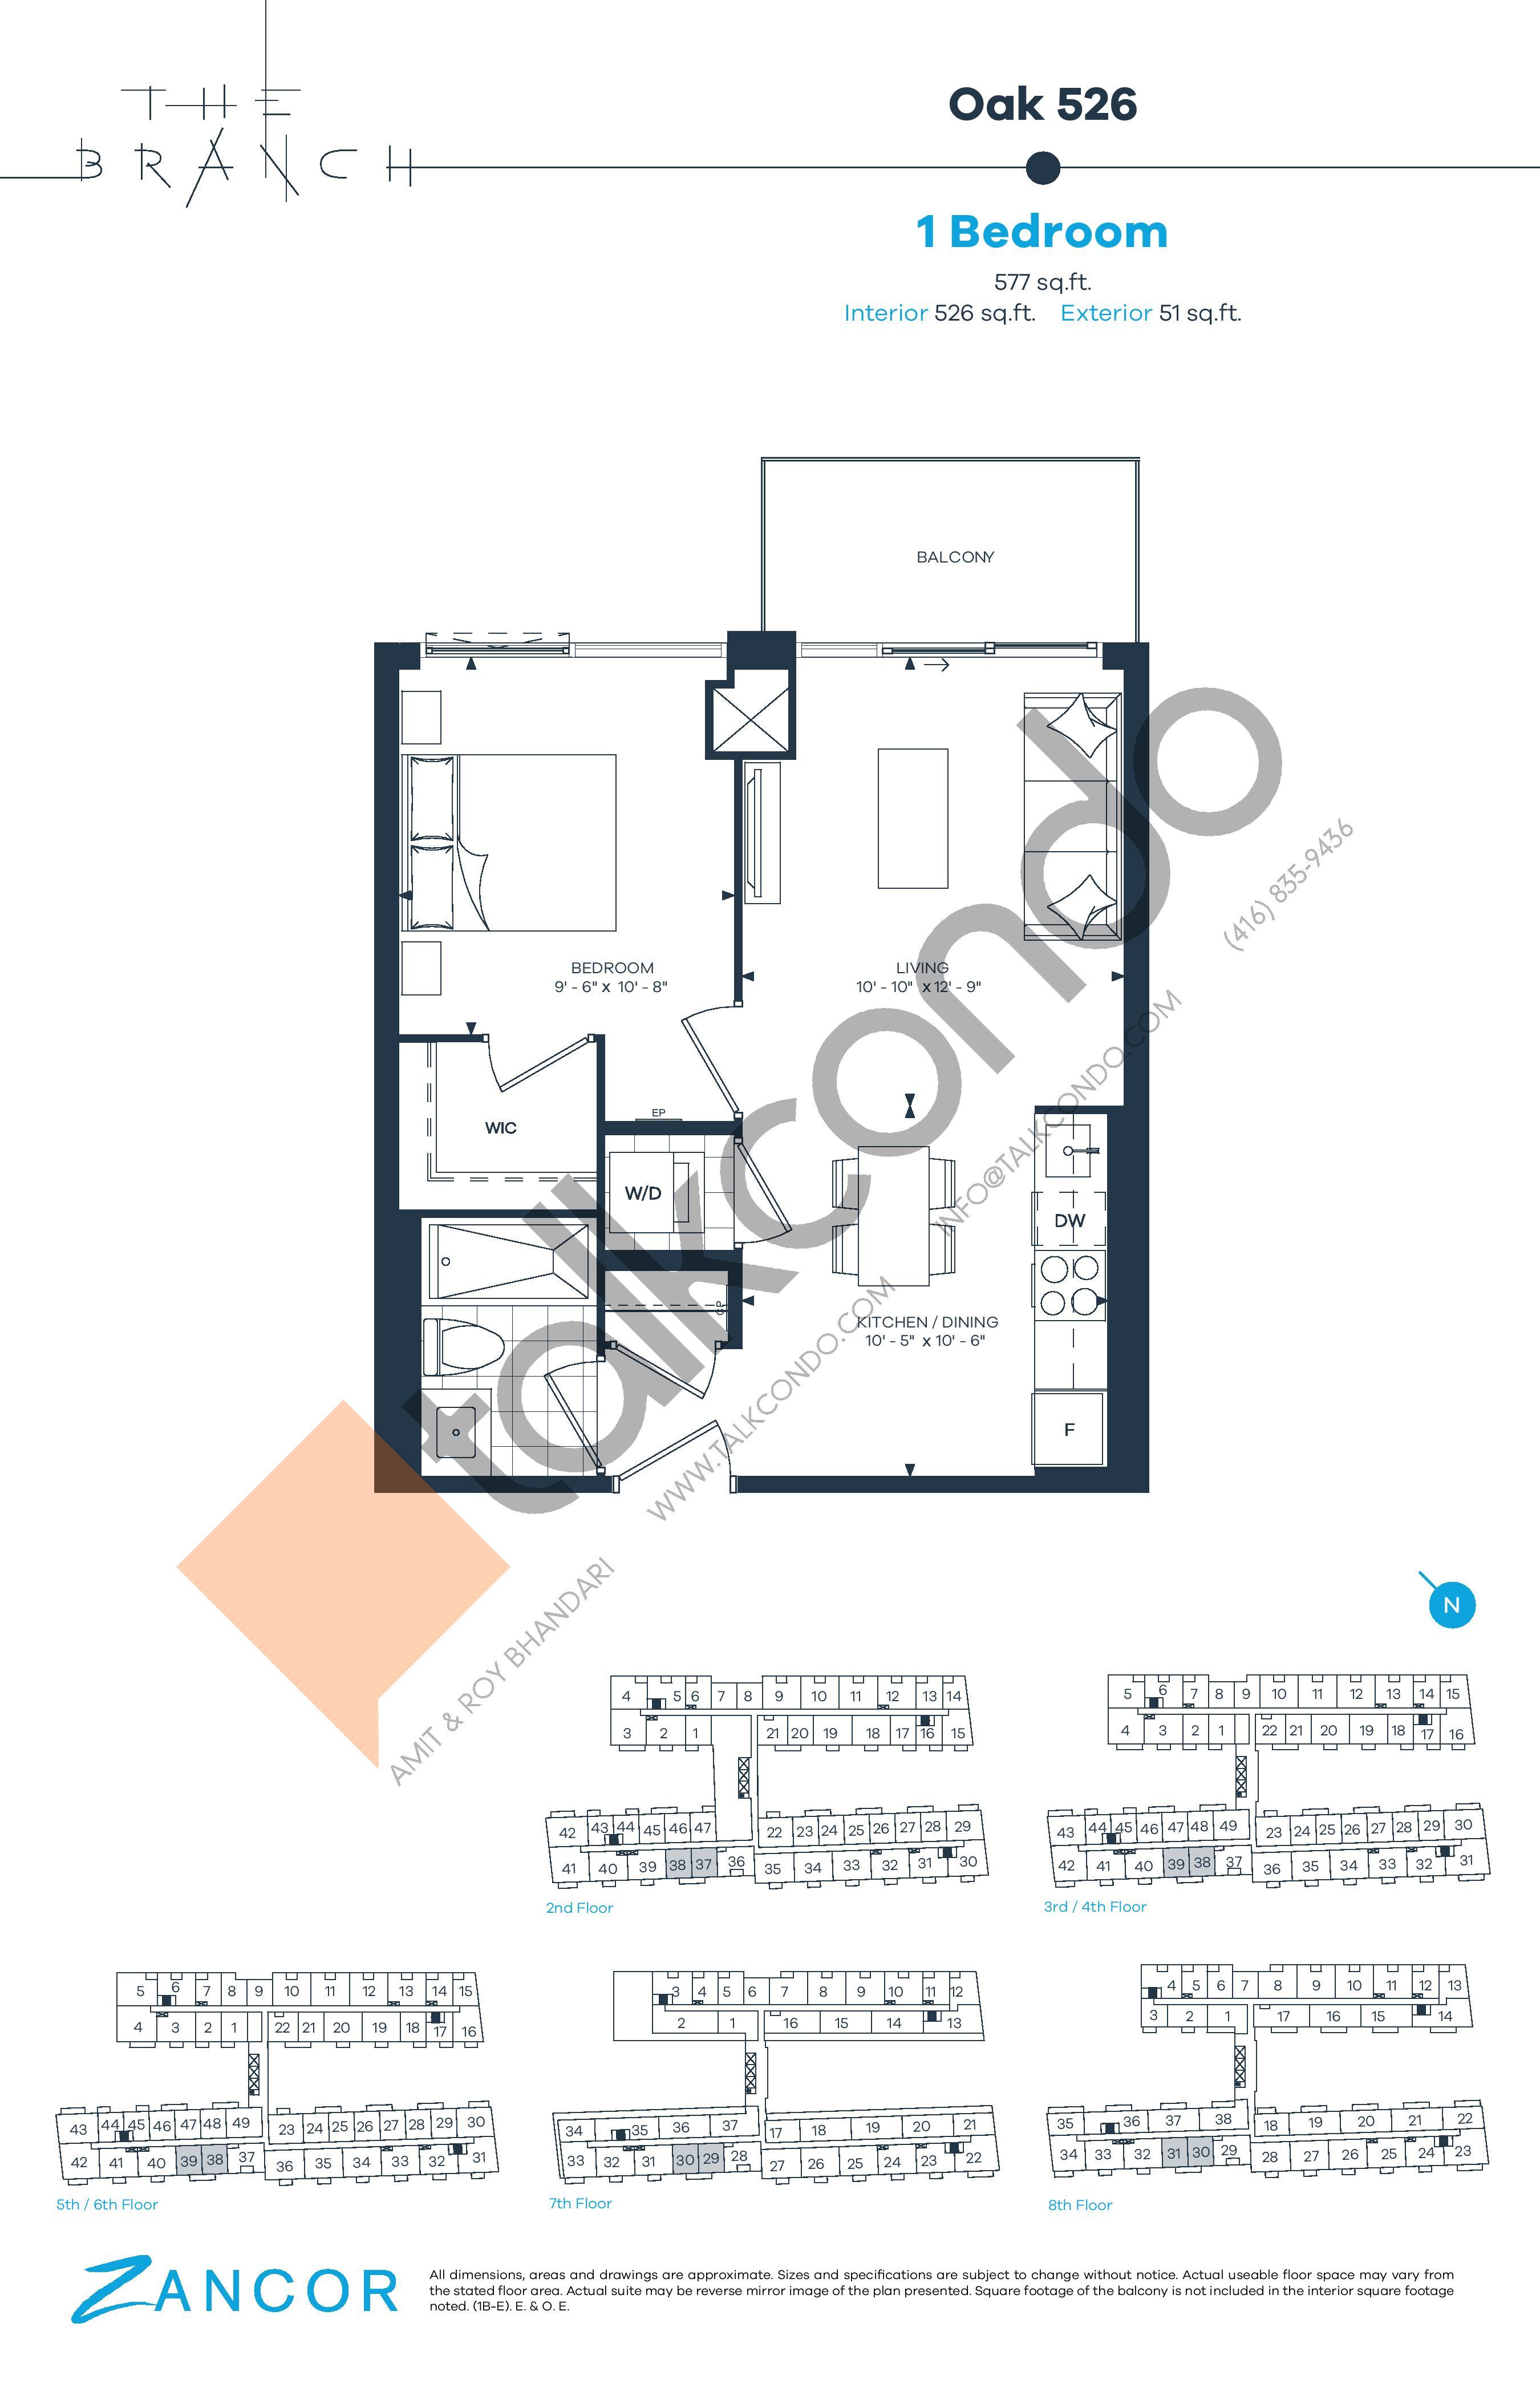 Oak 526 Floor Plan at The Branch Condos - 526 sq.ft